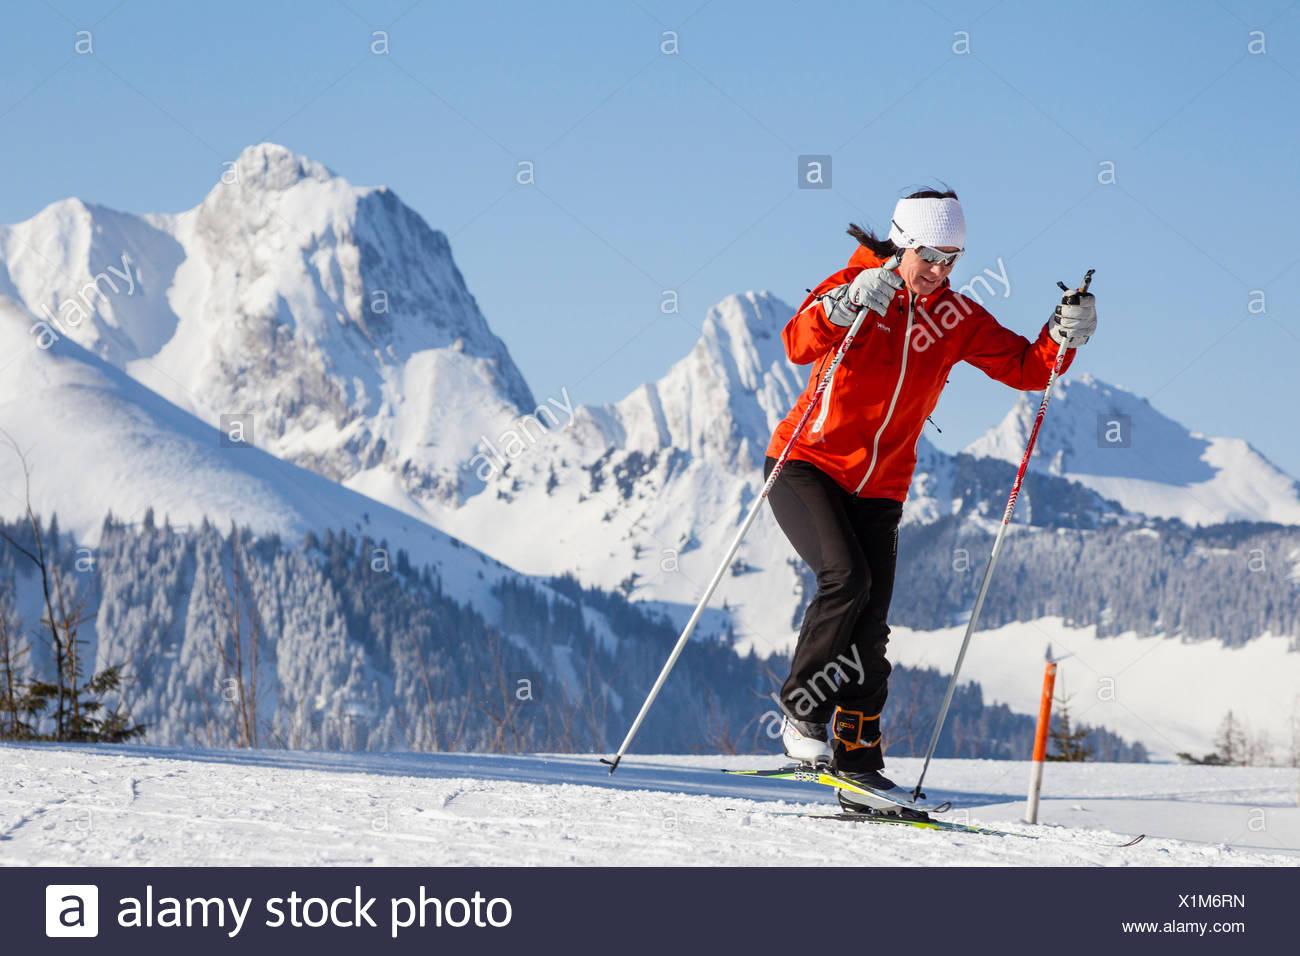 Woman cross-country skiing, Gantrisch area, Berner Oberland, Canton of Bern, Switzerland - Stock Image